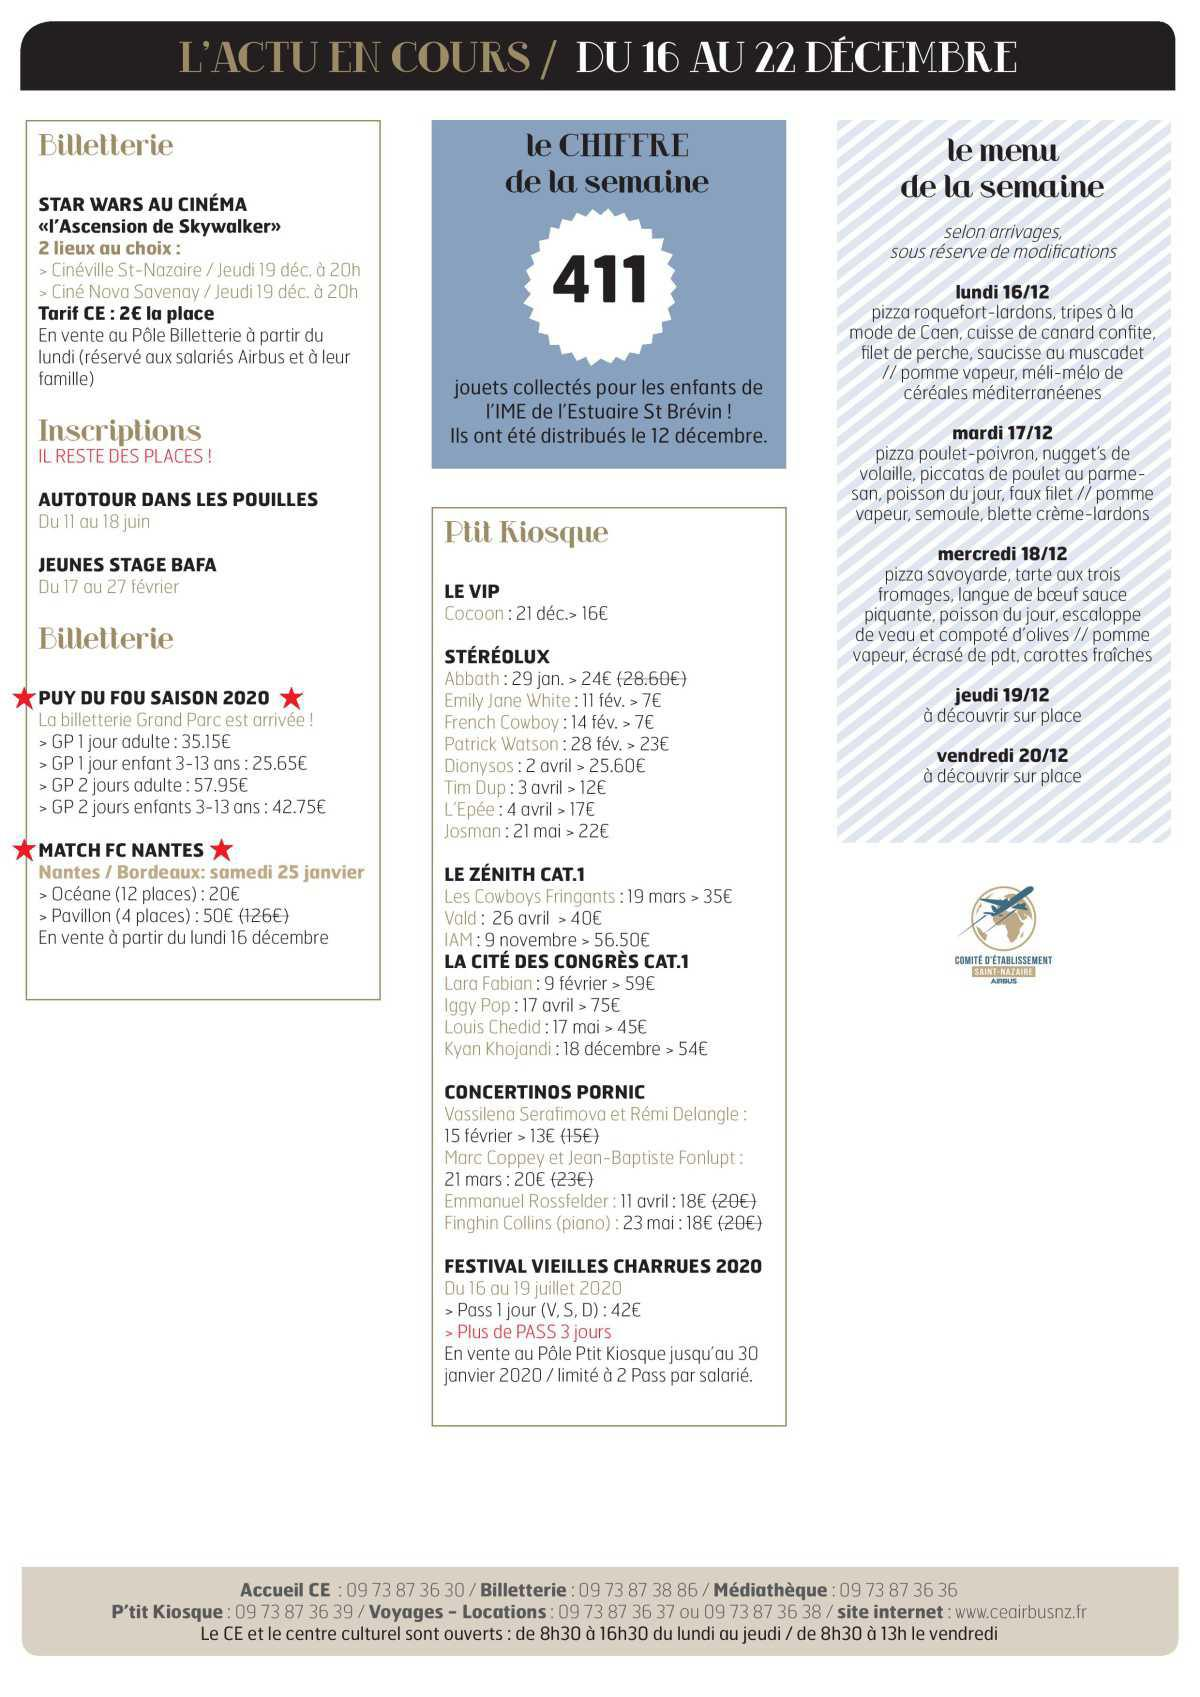 Infos CE/COOP Semaine 51